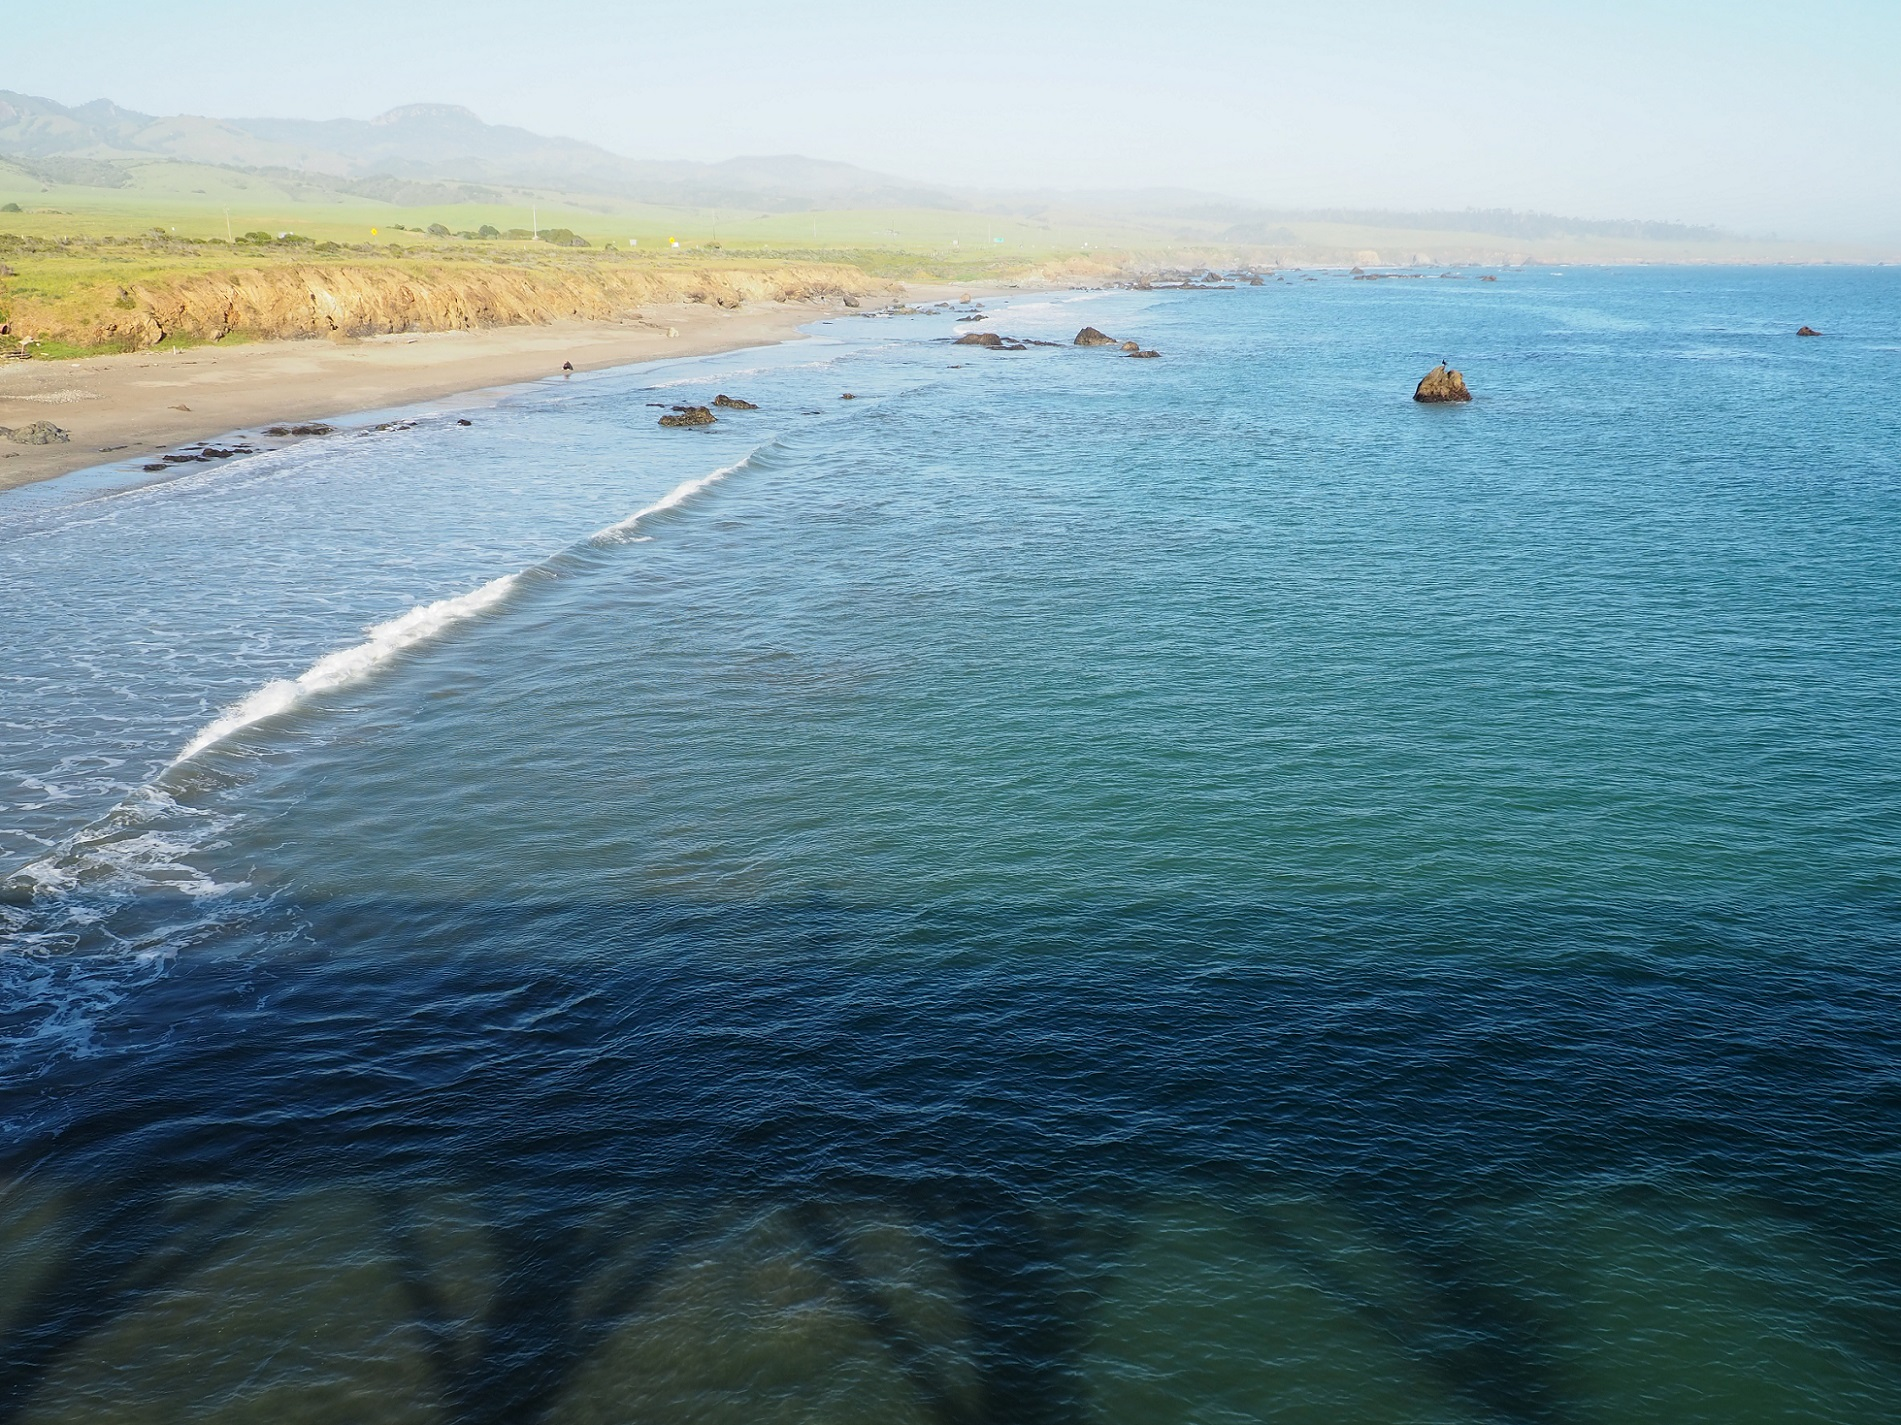 Océan pacifique depuis San Simeon pier en Californie